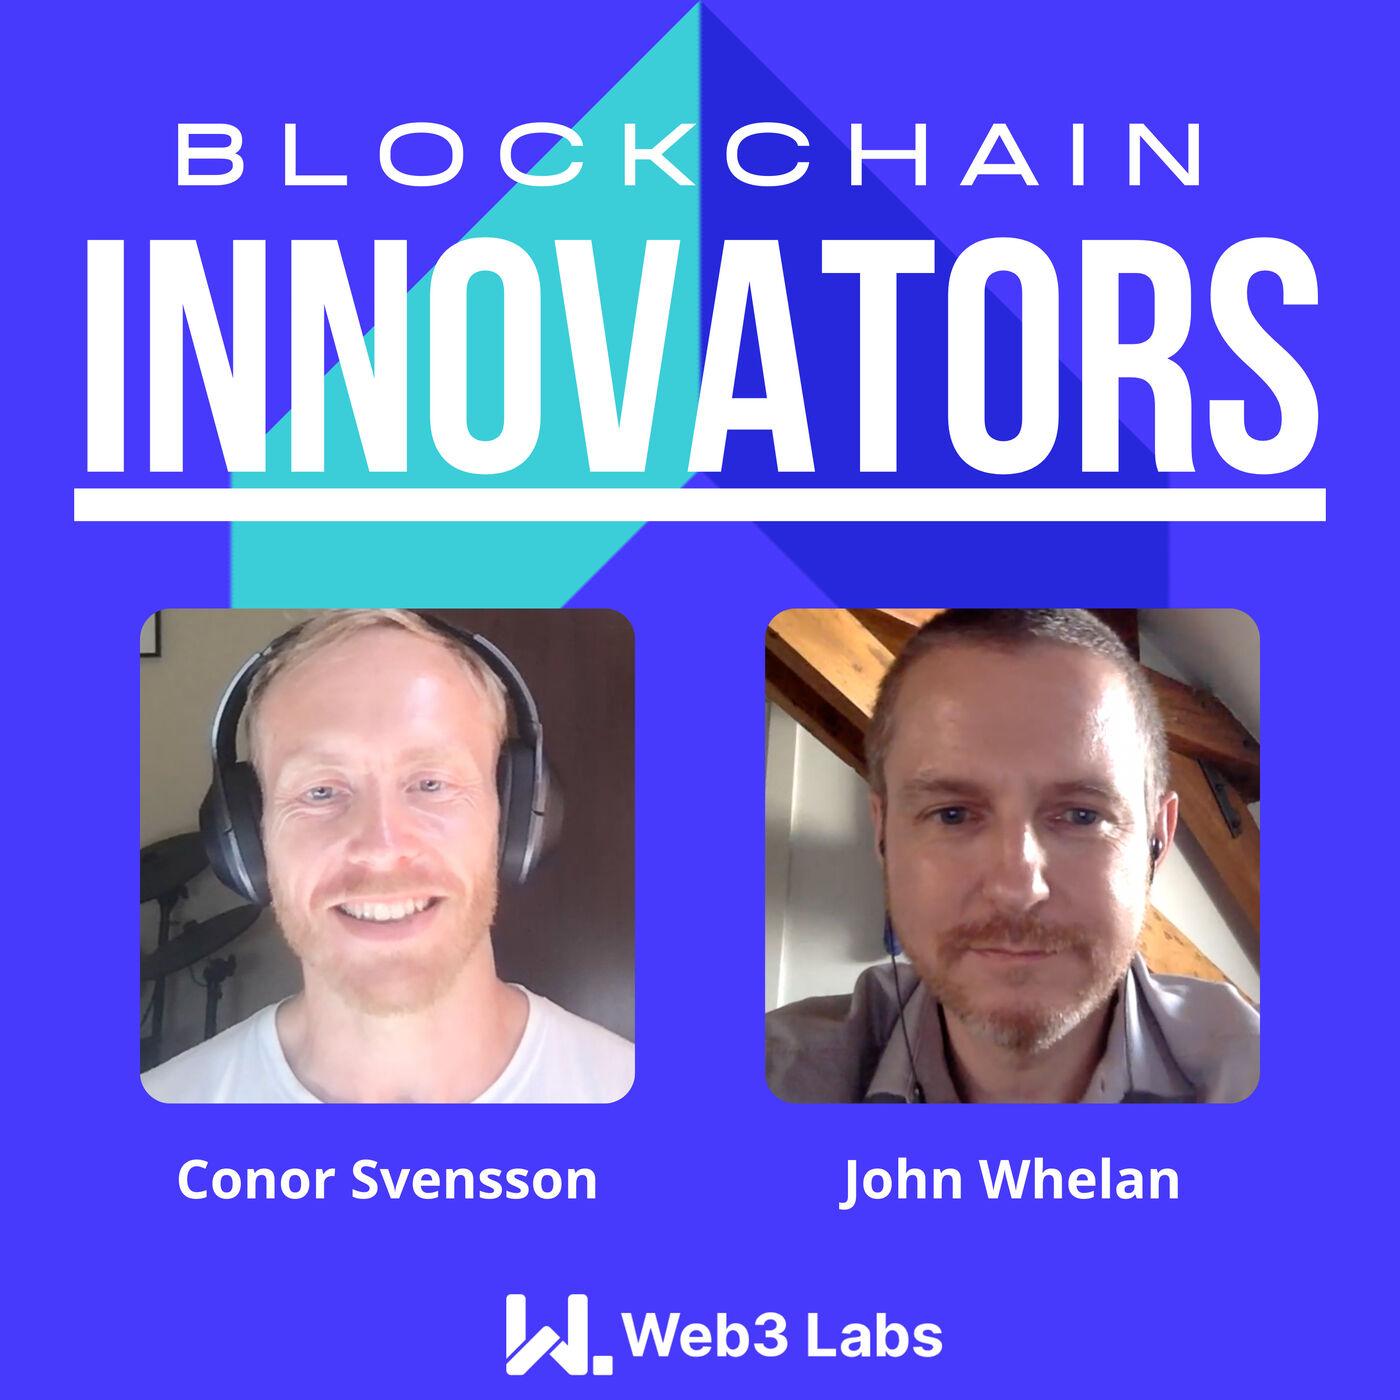 Blockchain Innovators - Conor Svensson and John Whelan